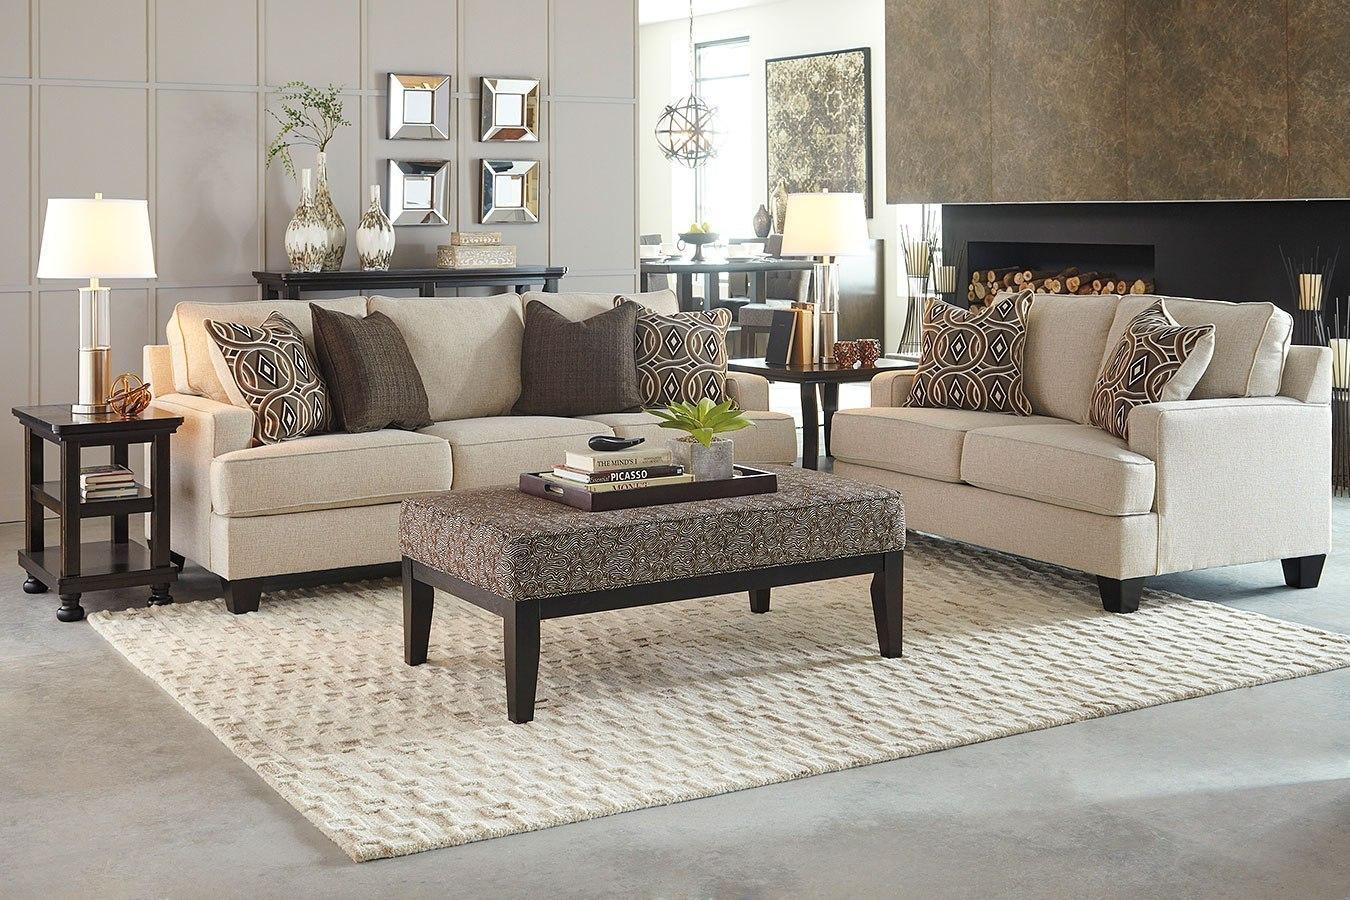 Bernat linen living room set signature design by ashley furniture cart